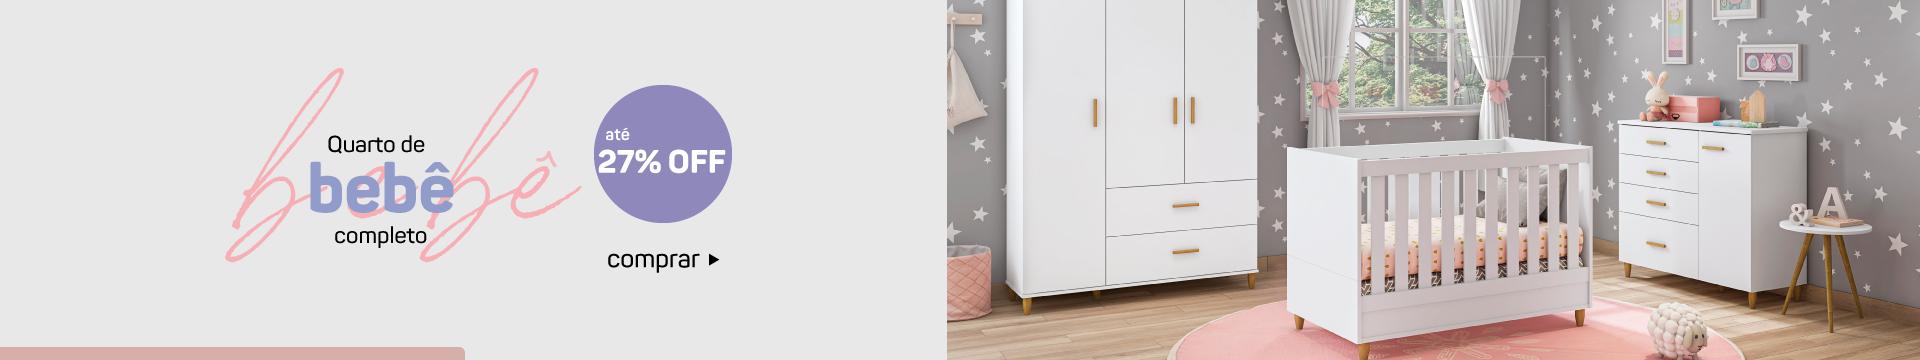 banner desktop quarto de bebe